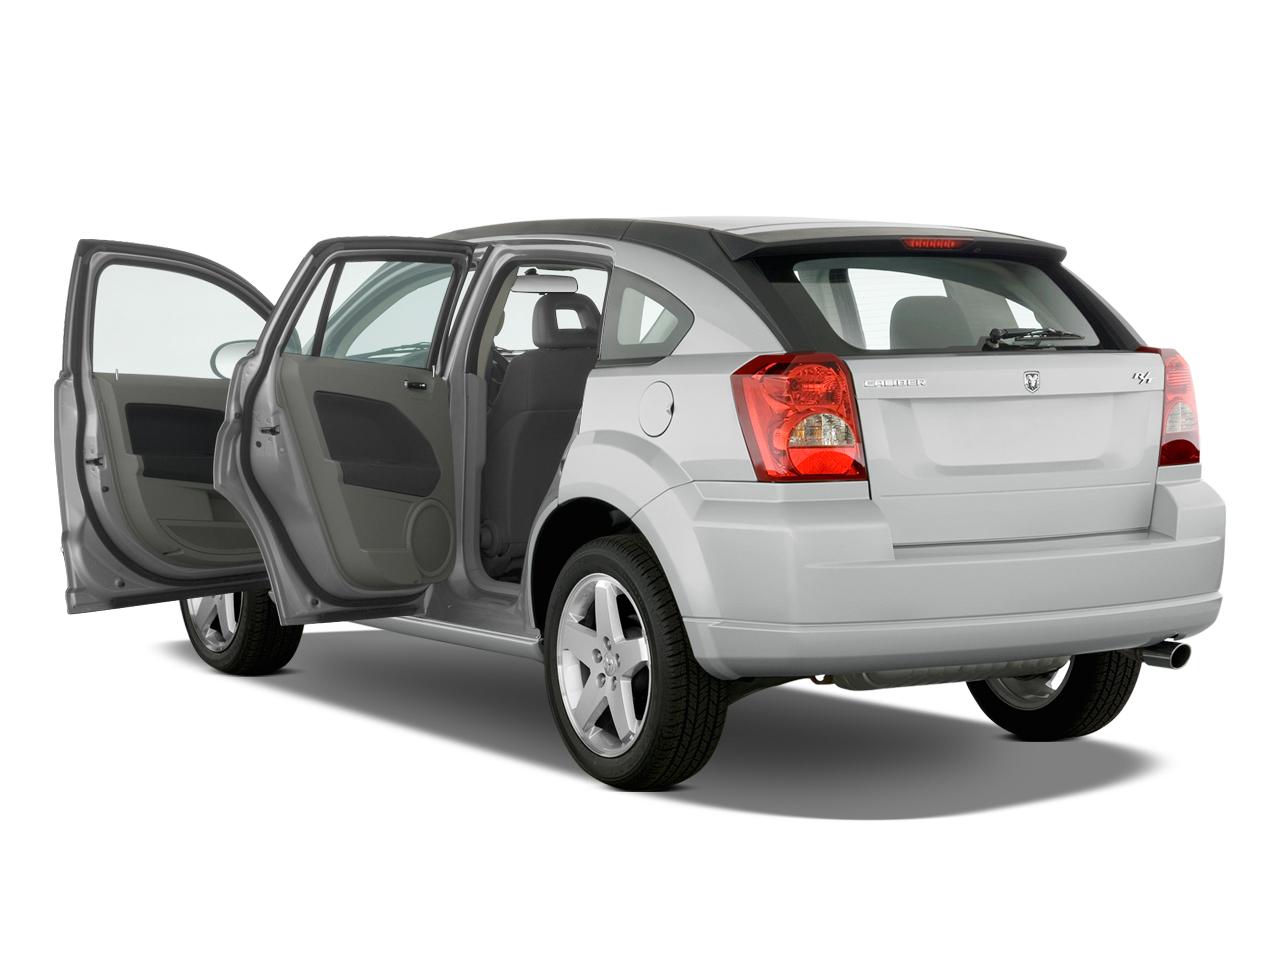 top vehicles for drivers over 6 39 the dodge caliber. Black Bedroom Furniture Sets. Home Design Ideas